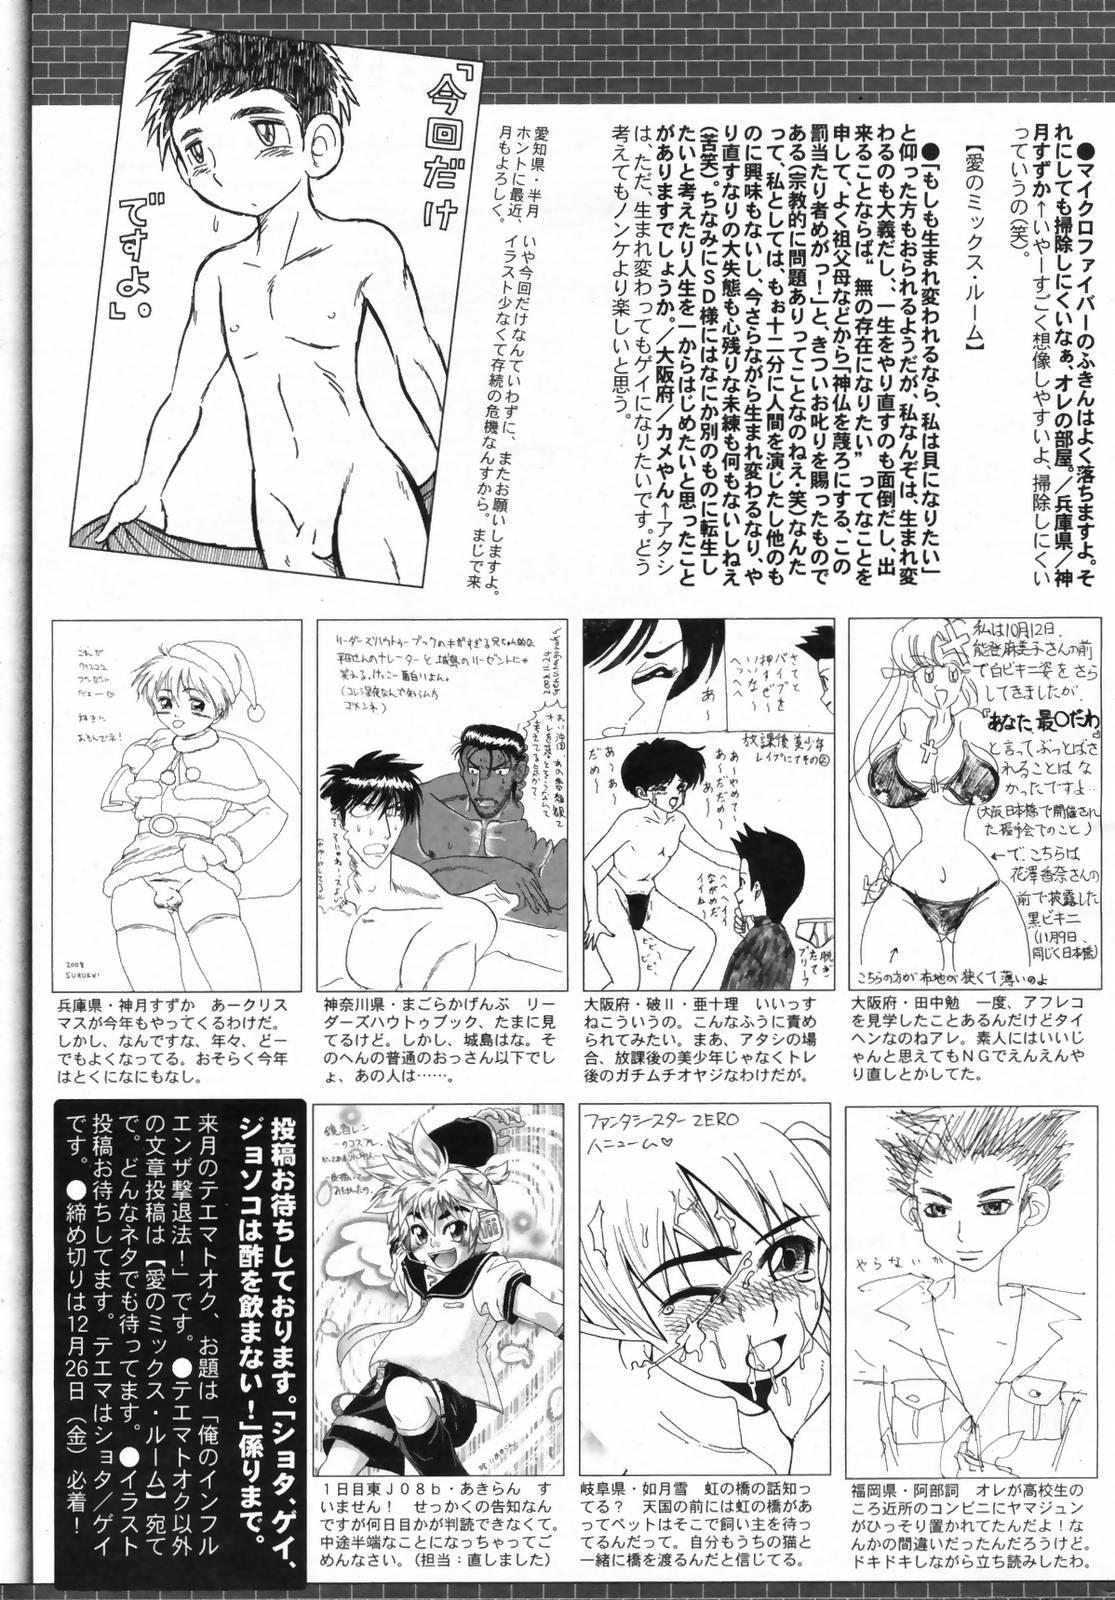 Manga Bangaichi 2009-02 Vol. 234 264